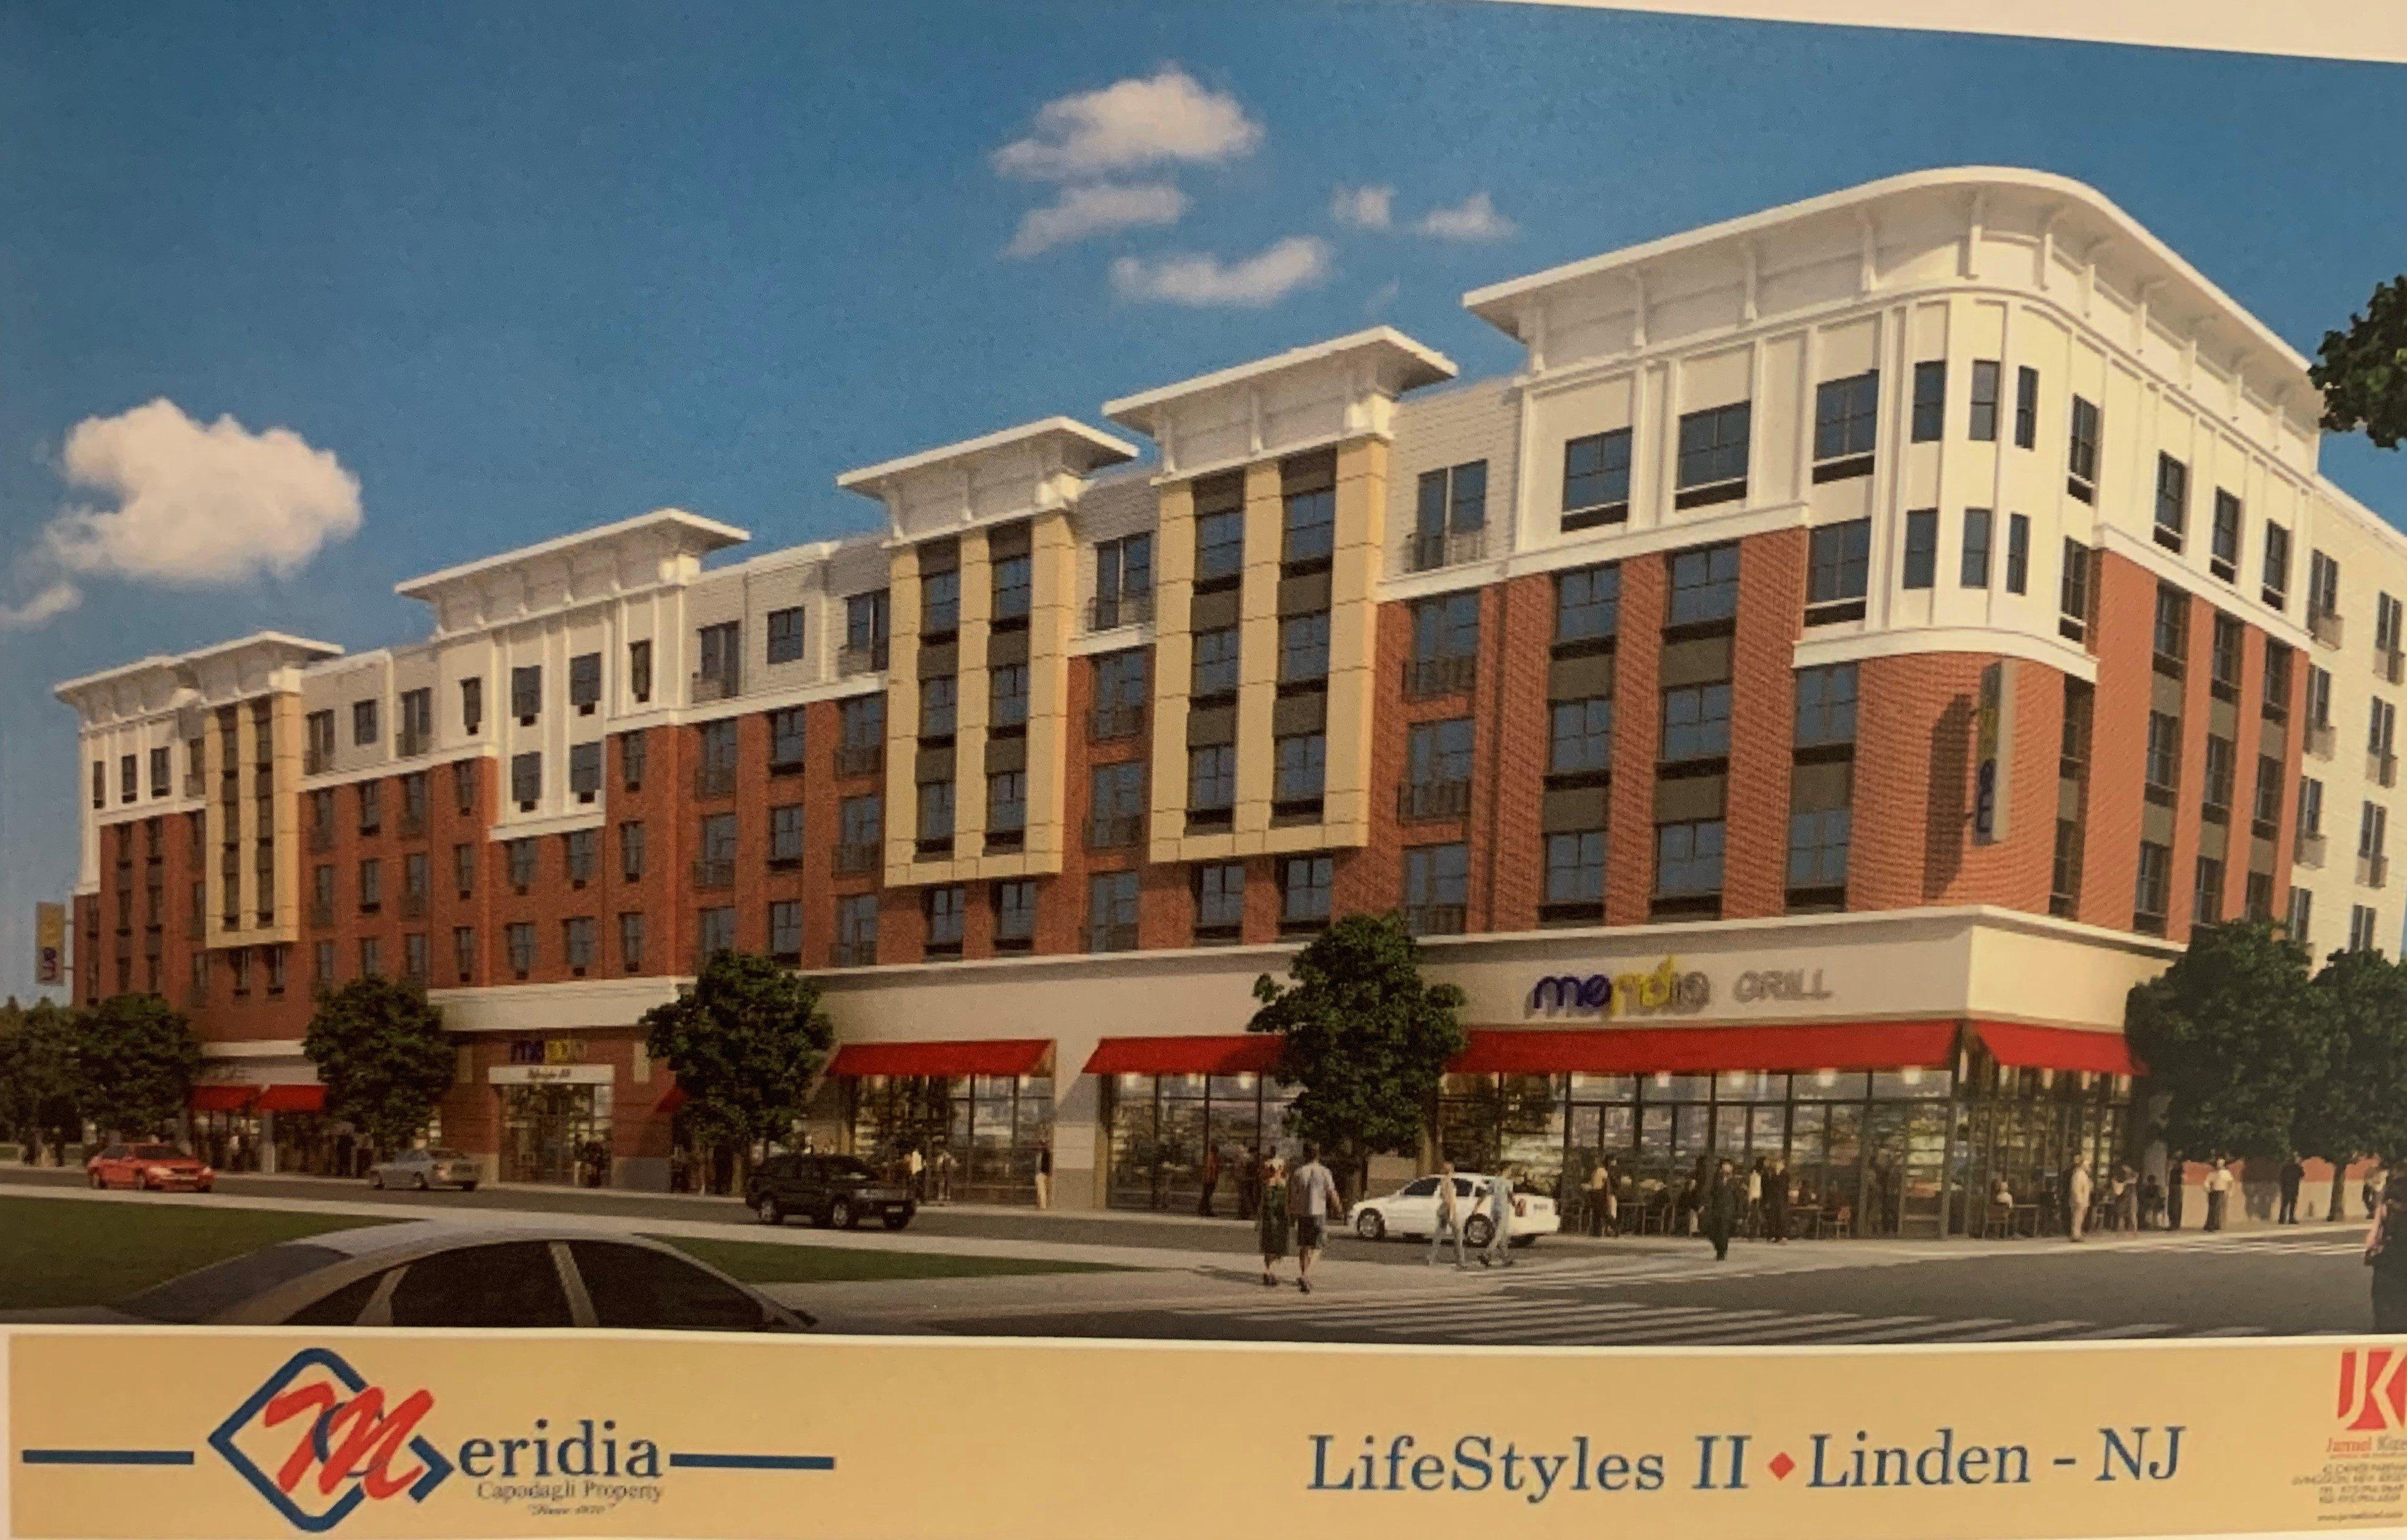 Lifestyles II, Linden, NJ